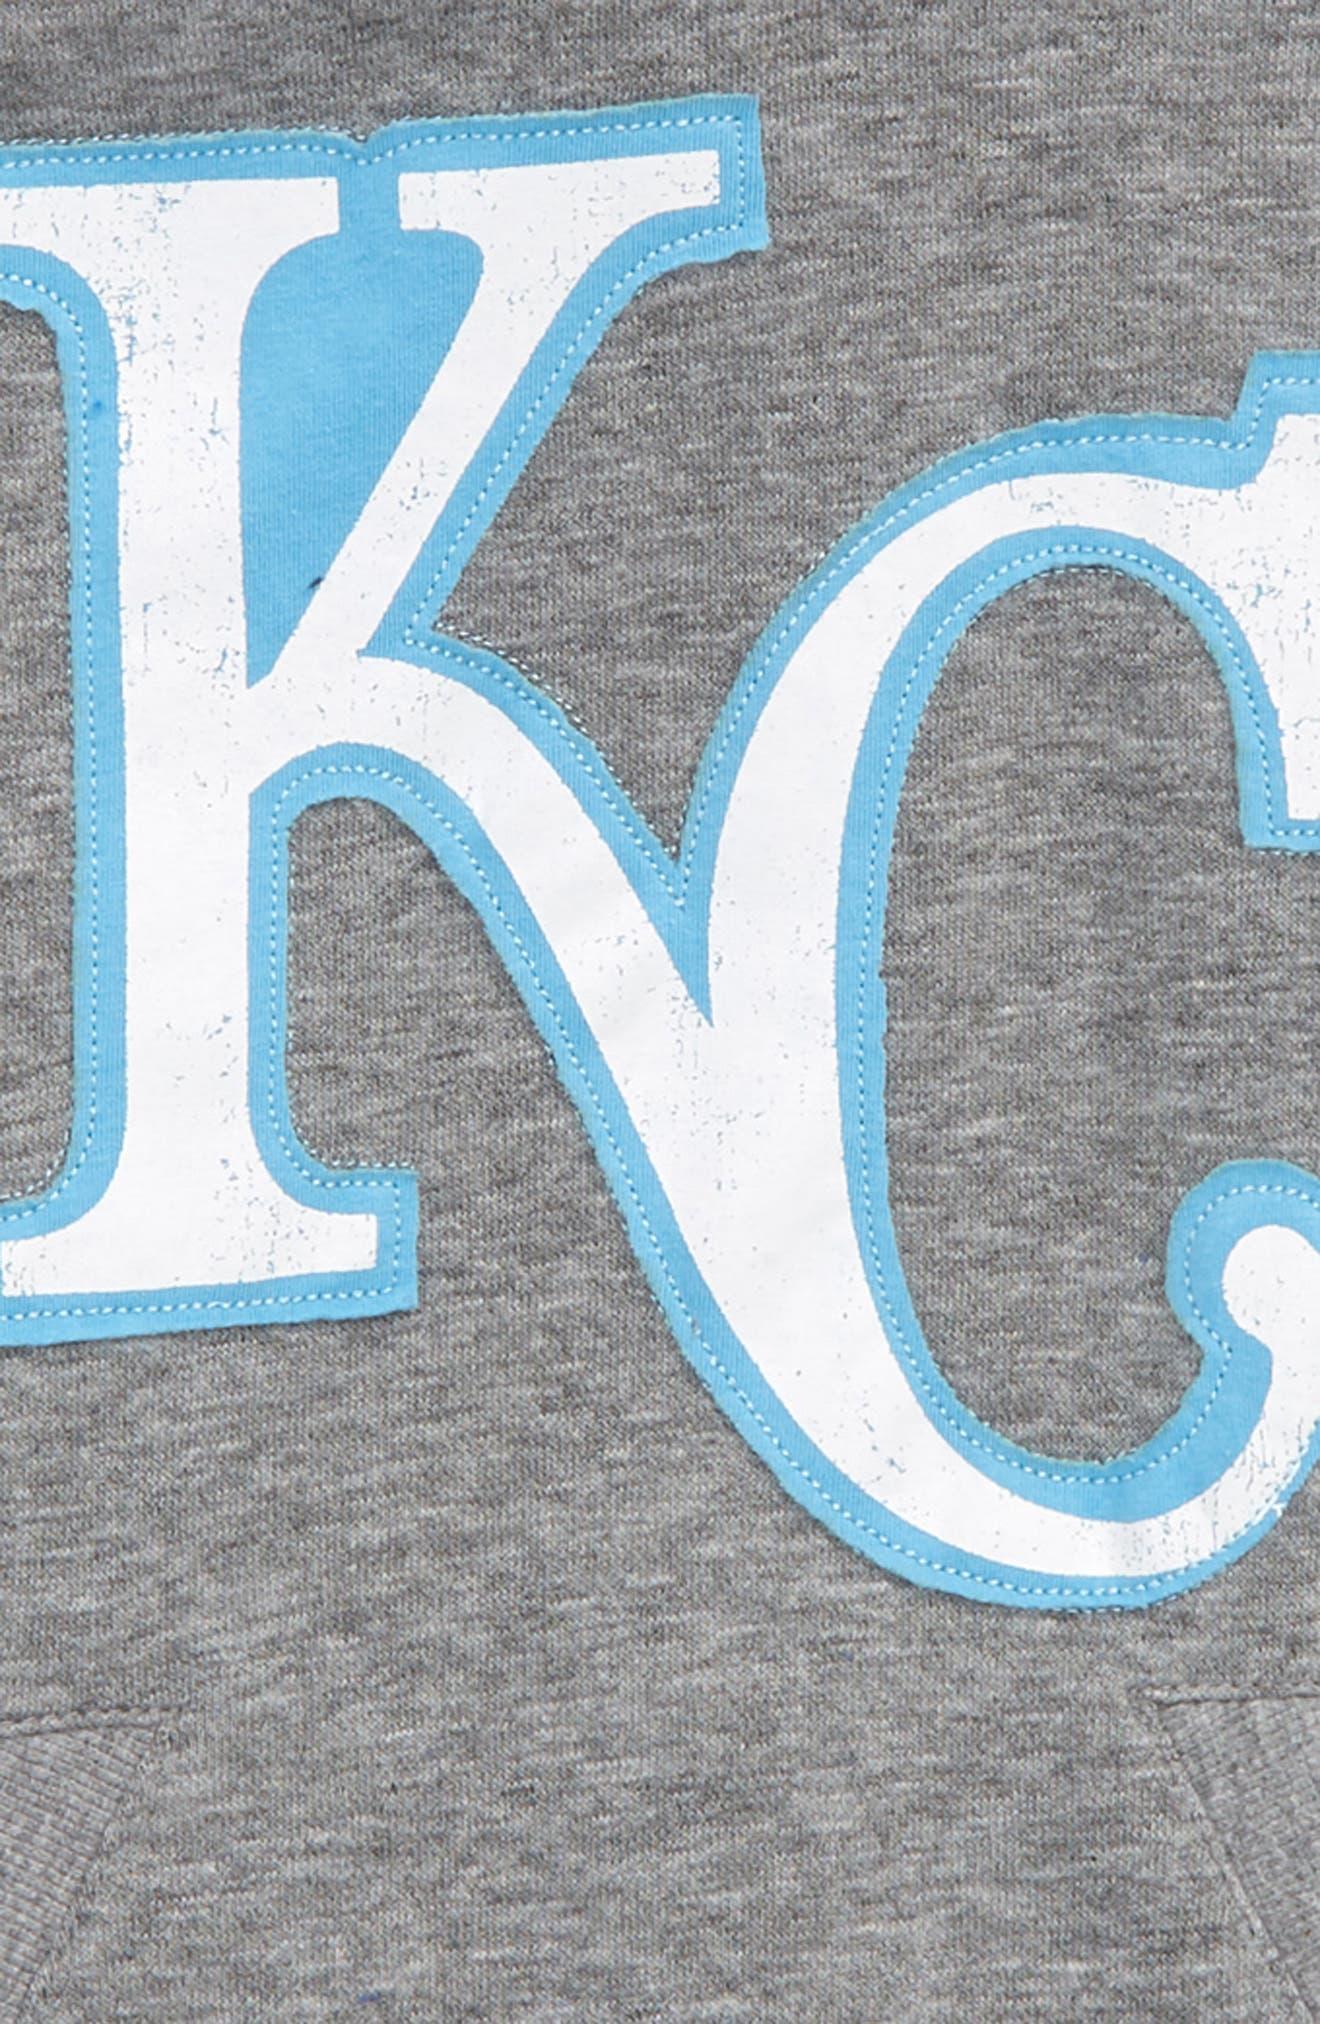 New Beginnings - Kansas City Royals Pullover Hoodie,                             Alternate thumbnail 2, color,                             Gray